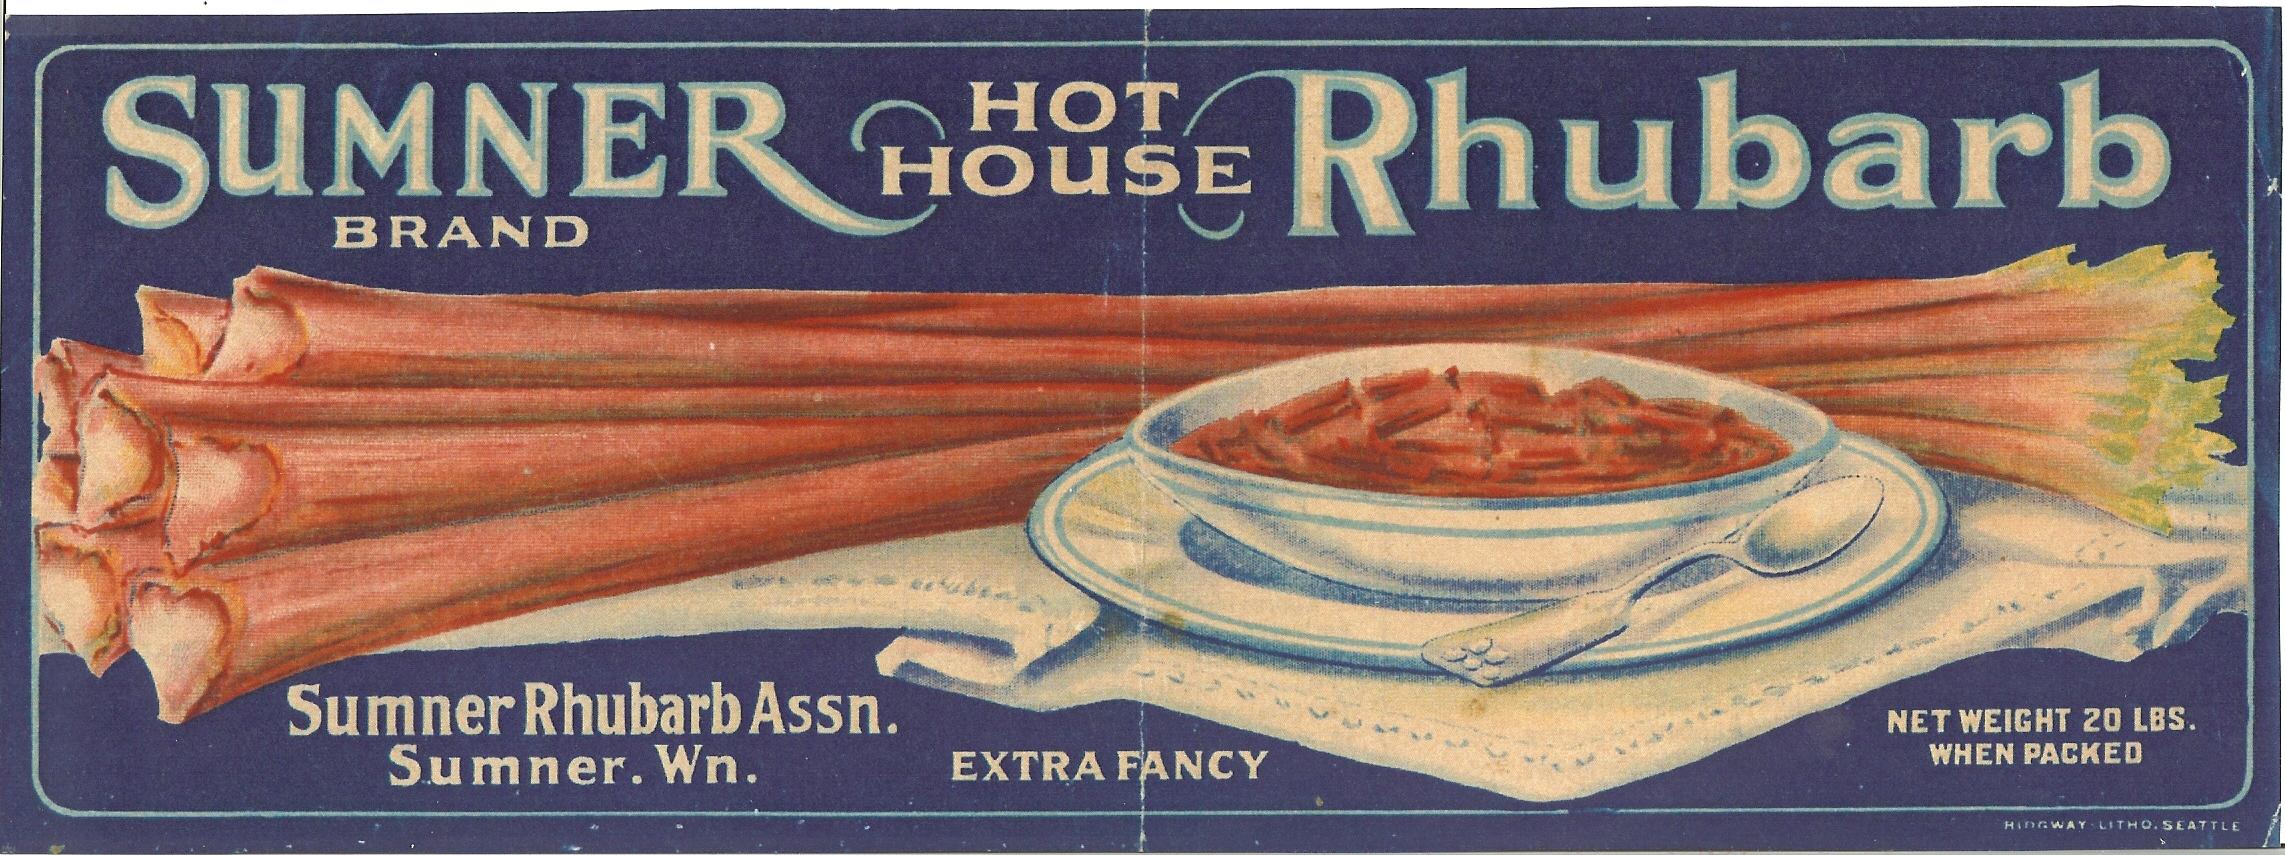 rhubarb-crate-label-1931